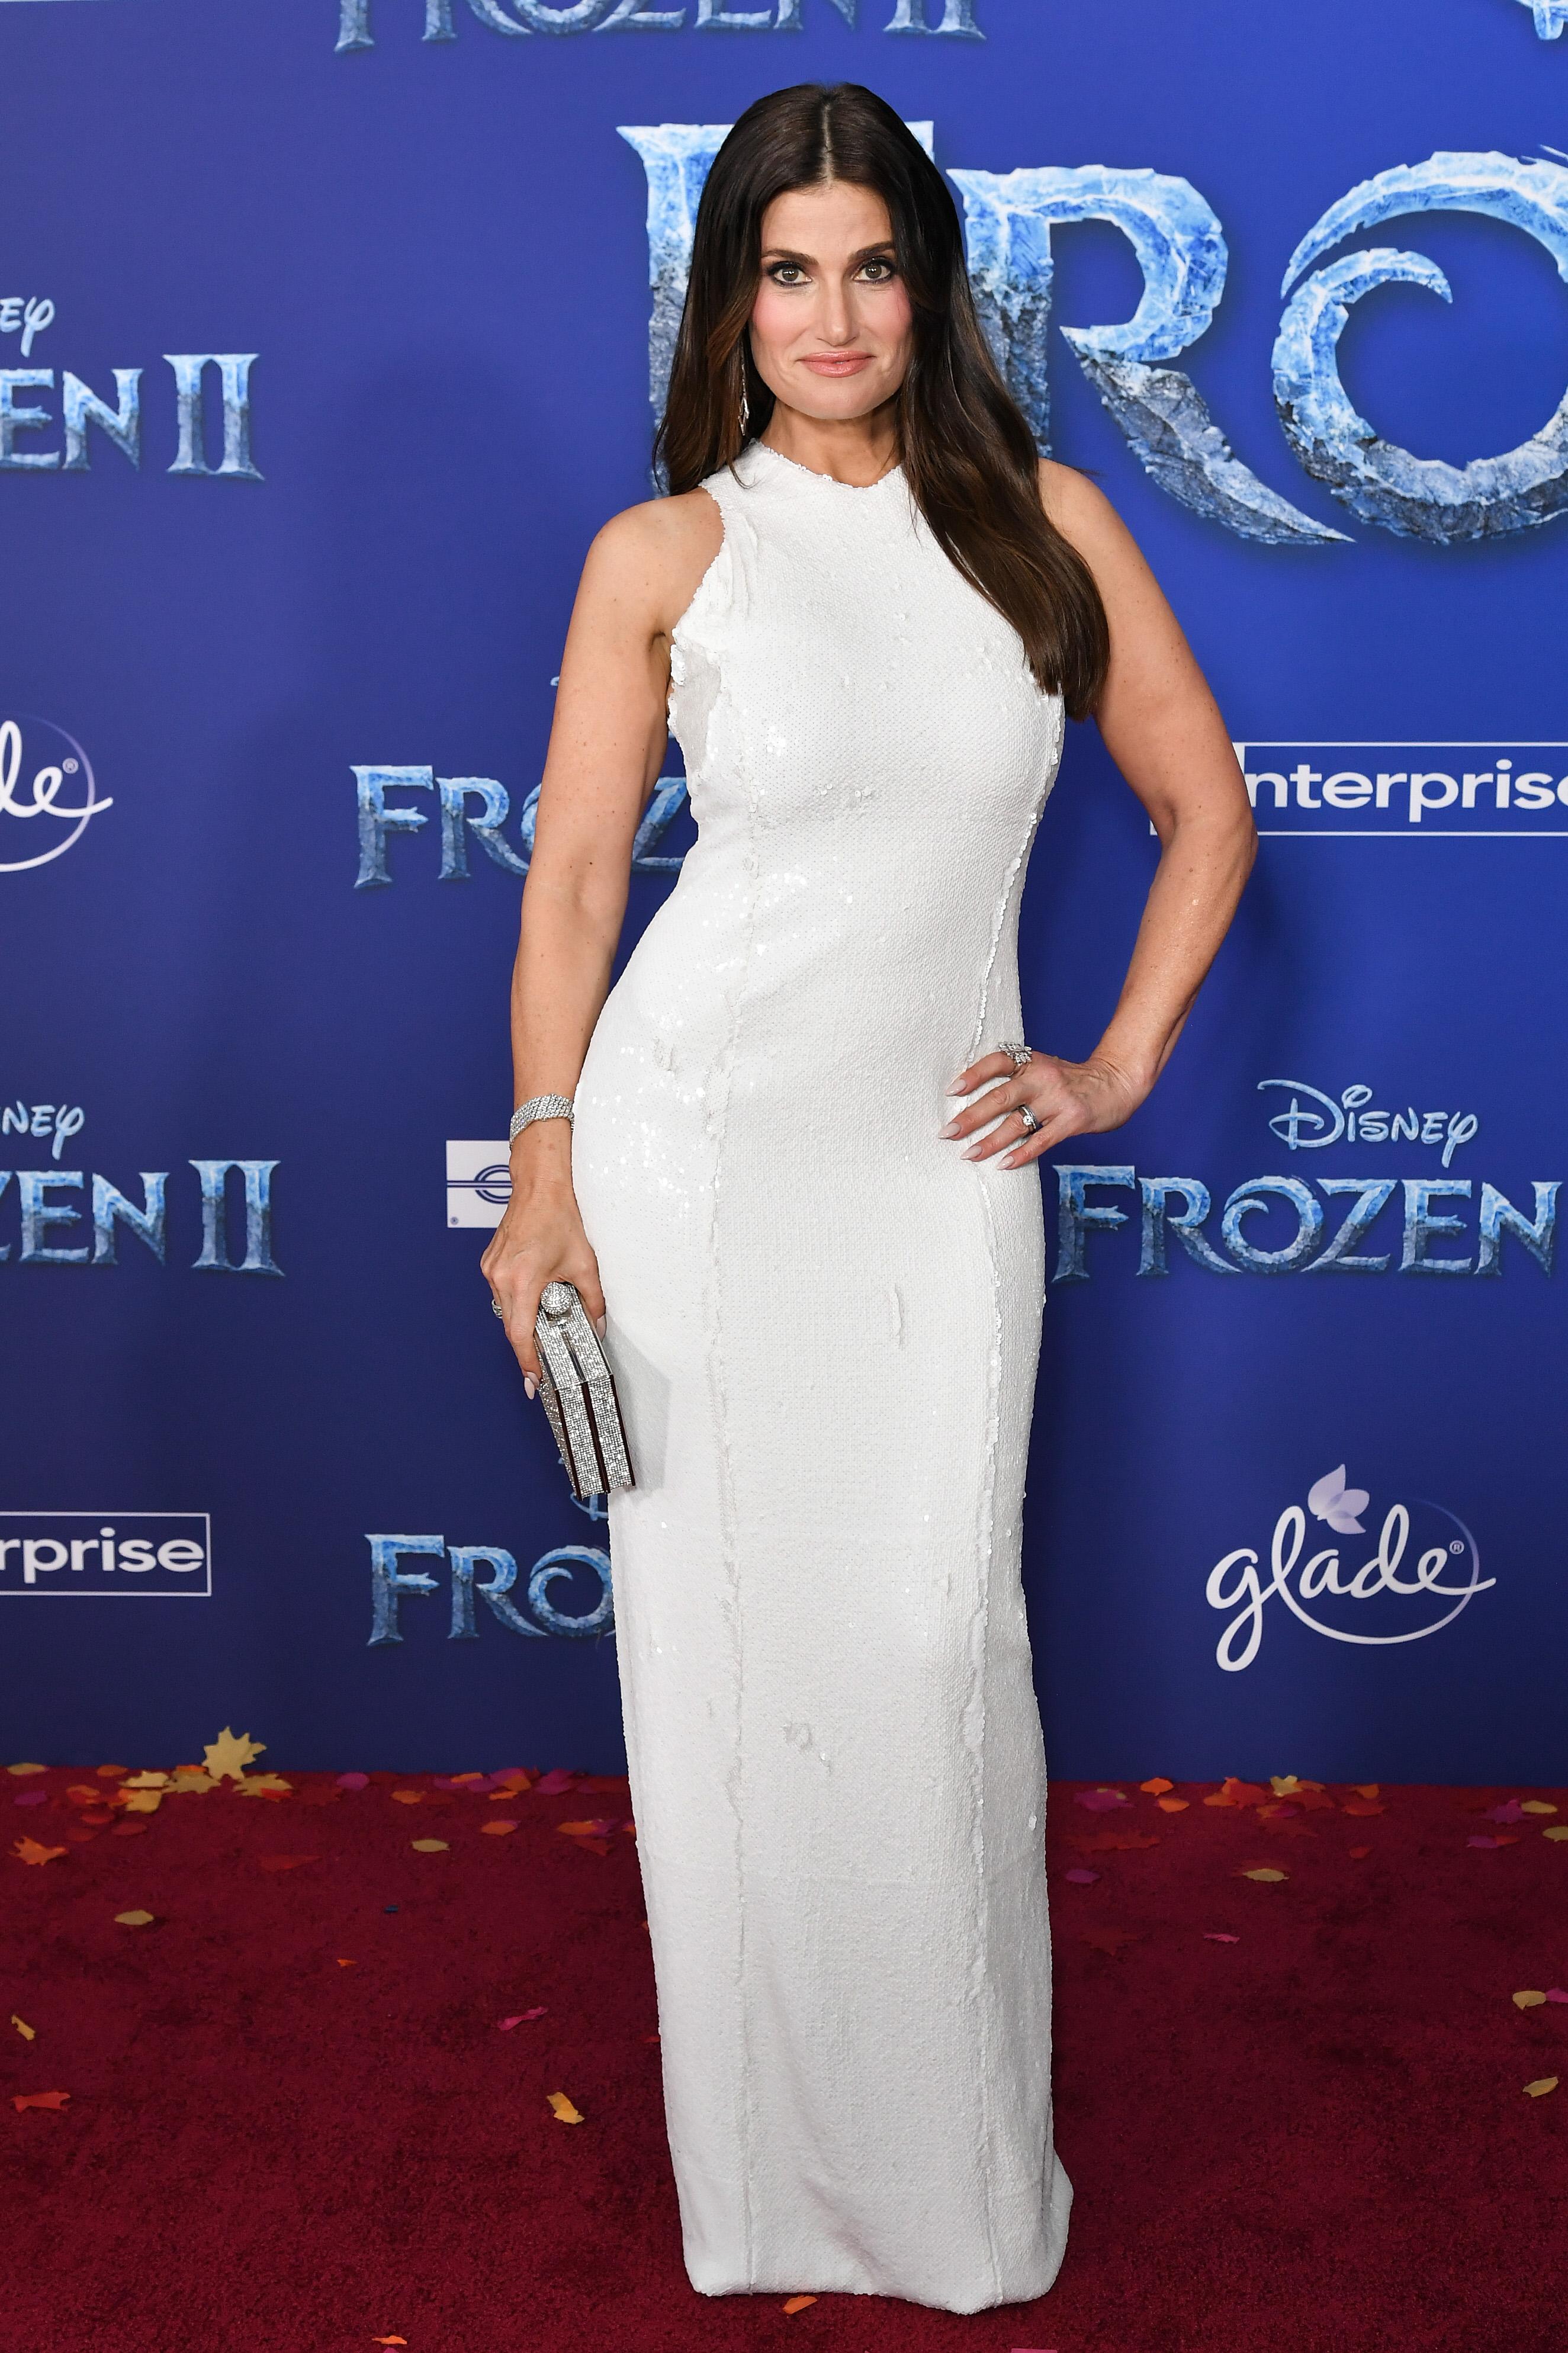 Idina Menzel'Frozen II' film premiere, Arrivals, Dolby Theatre, Los Angeles, USA - 07 Nov 2019Wearing Galvan